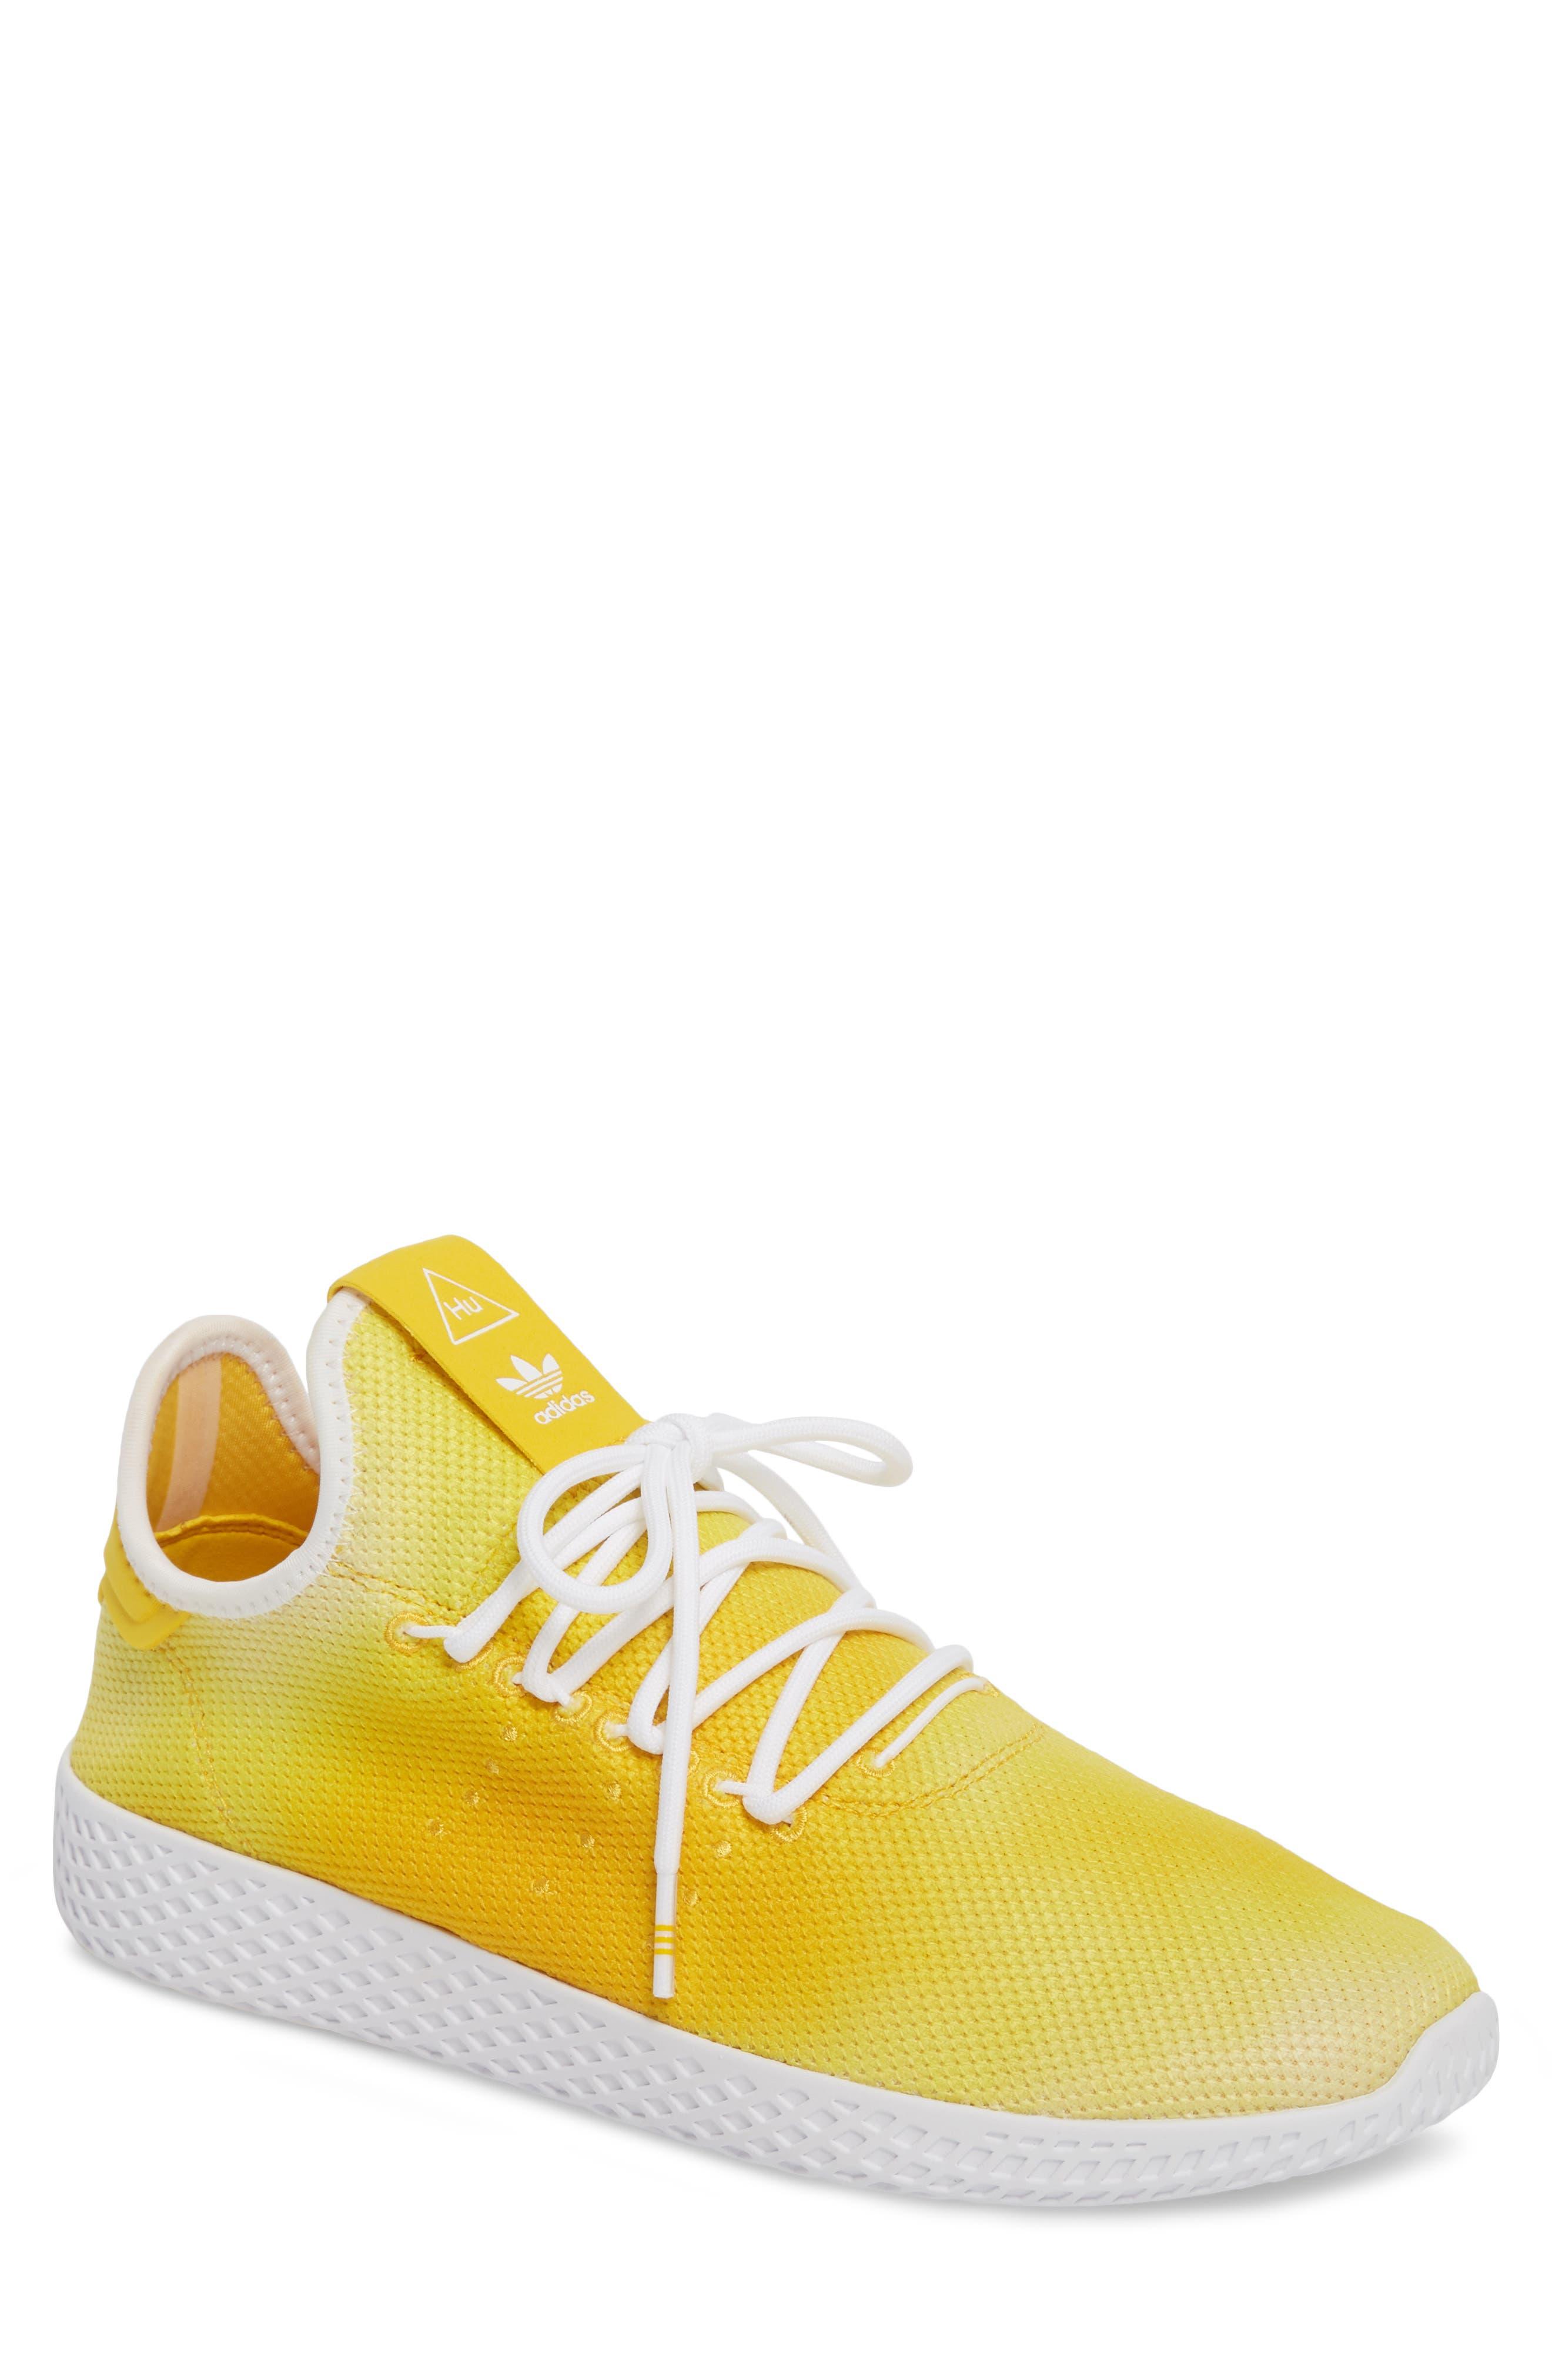 Pharrell Williams Tennis Hu Sneaker,                             Main thumbnail 1, color,                             YELLOW/ WHITE